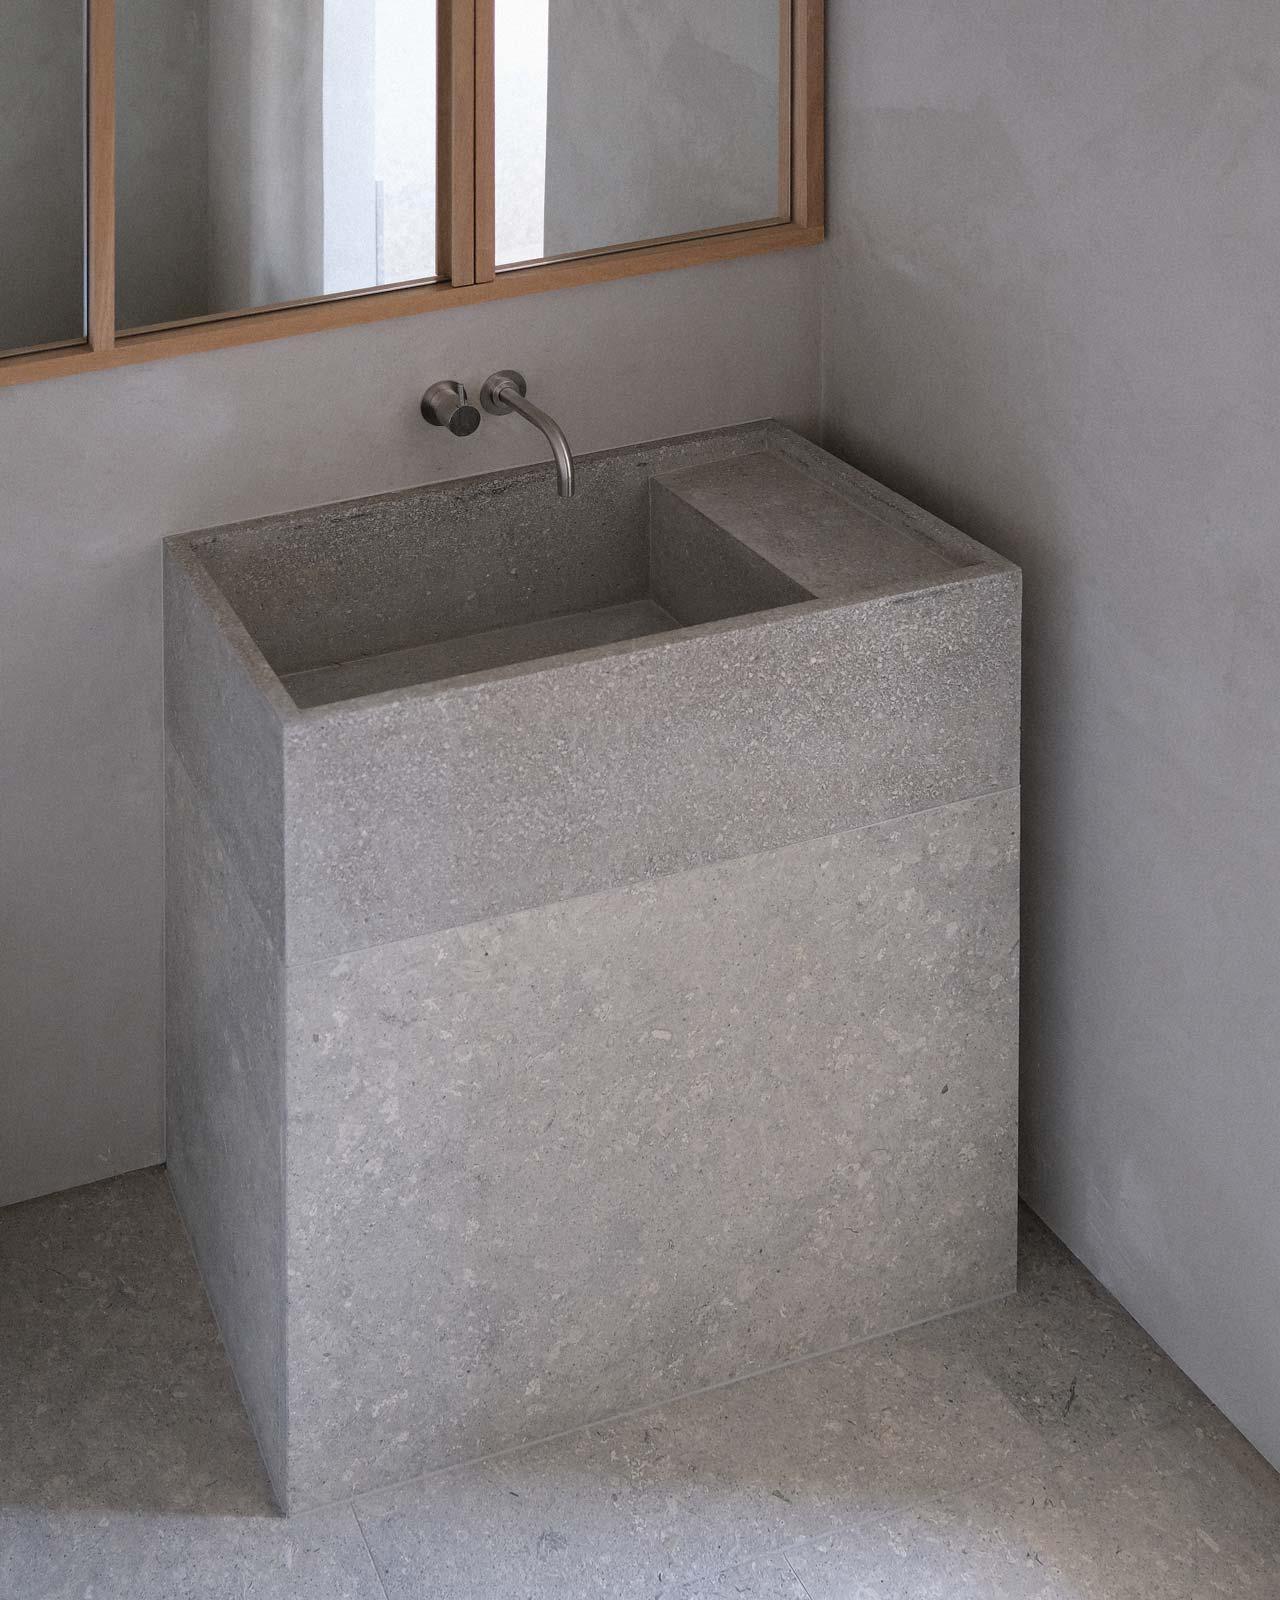 Architect stone bathroom ideas